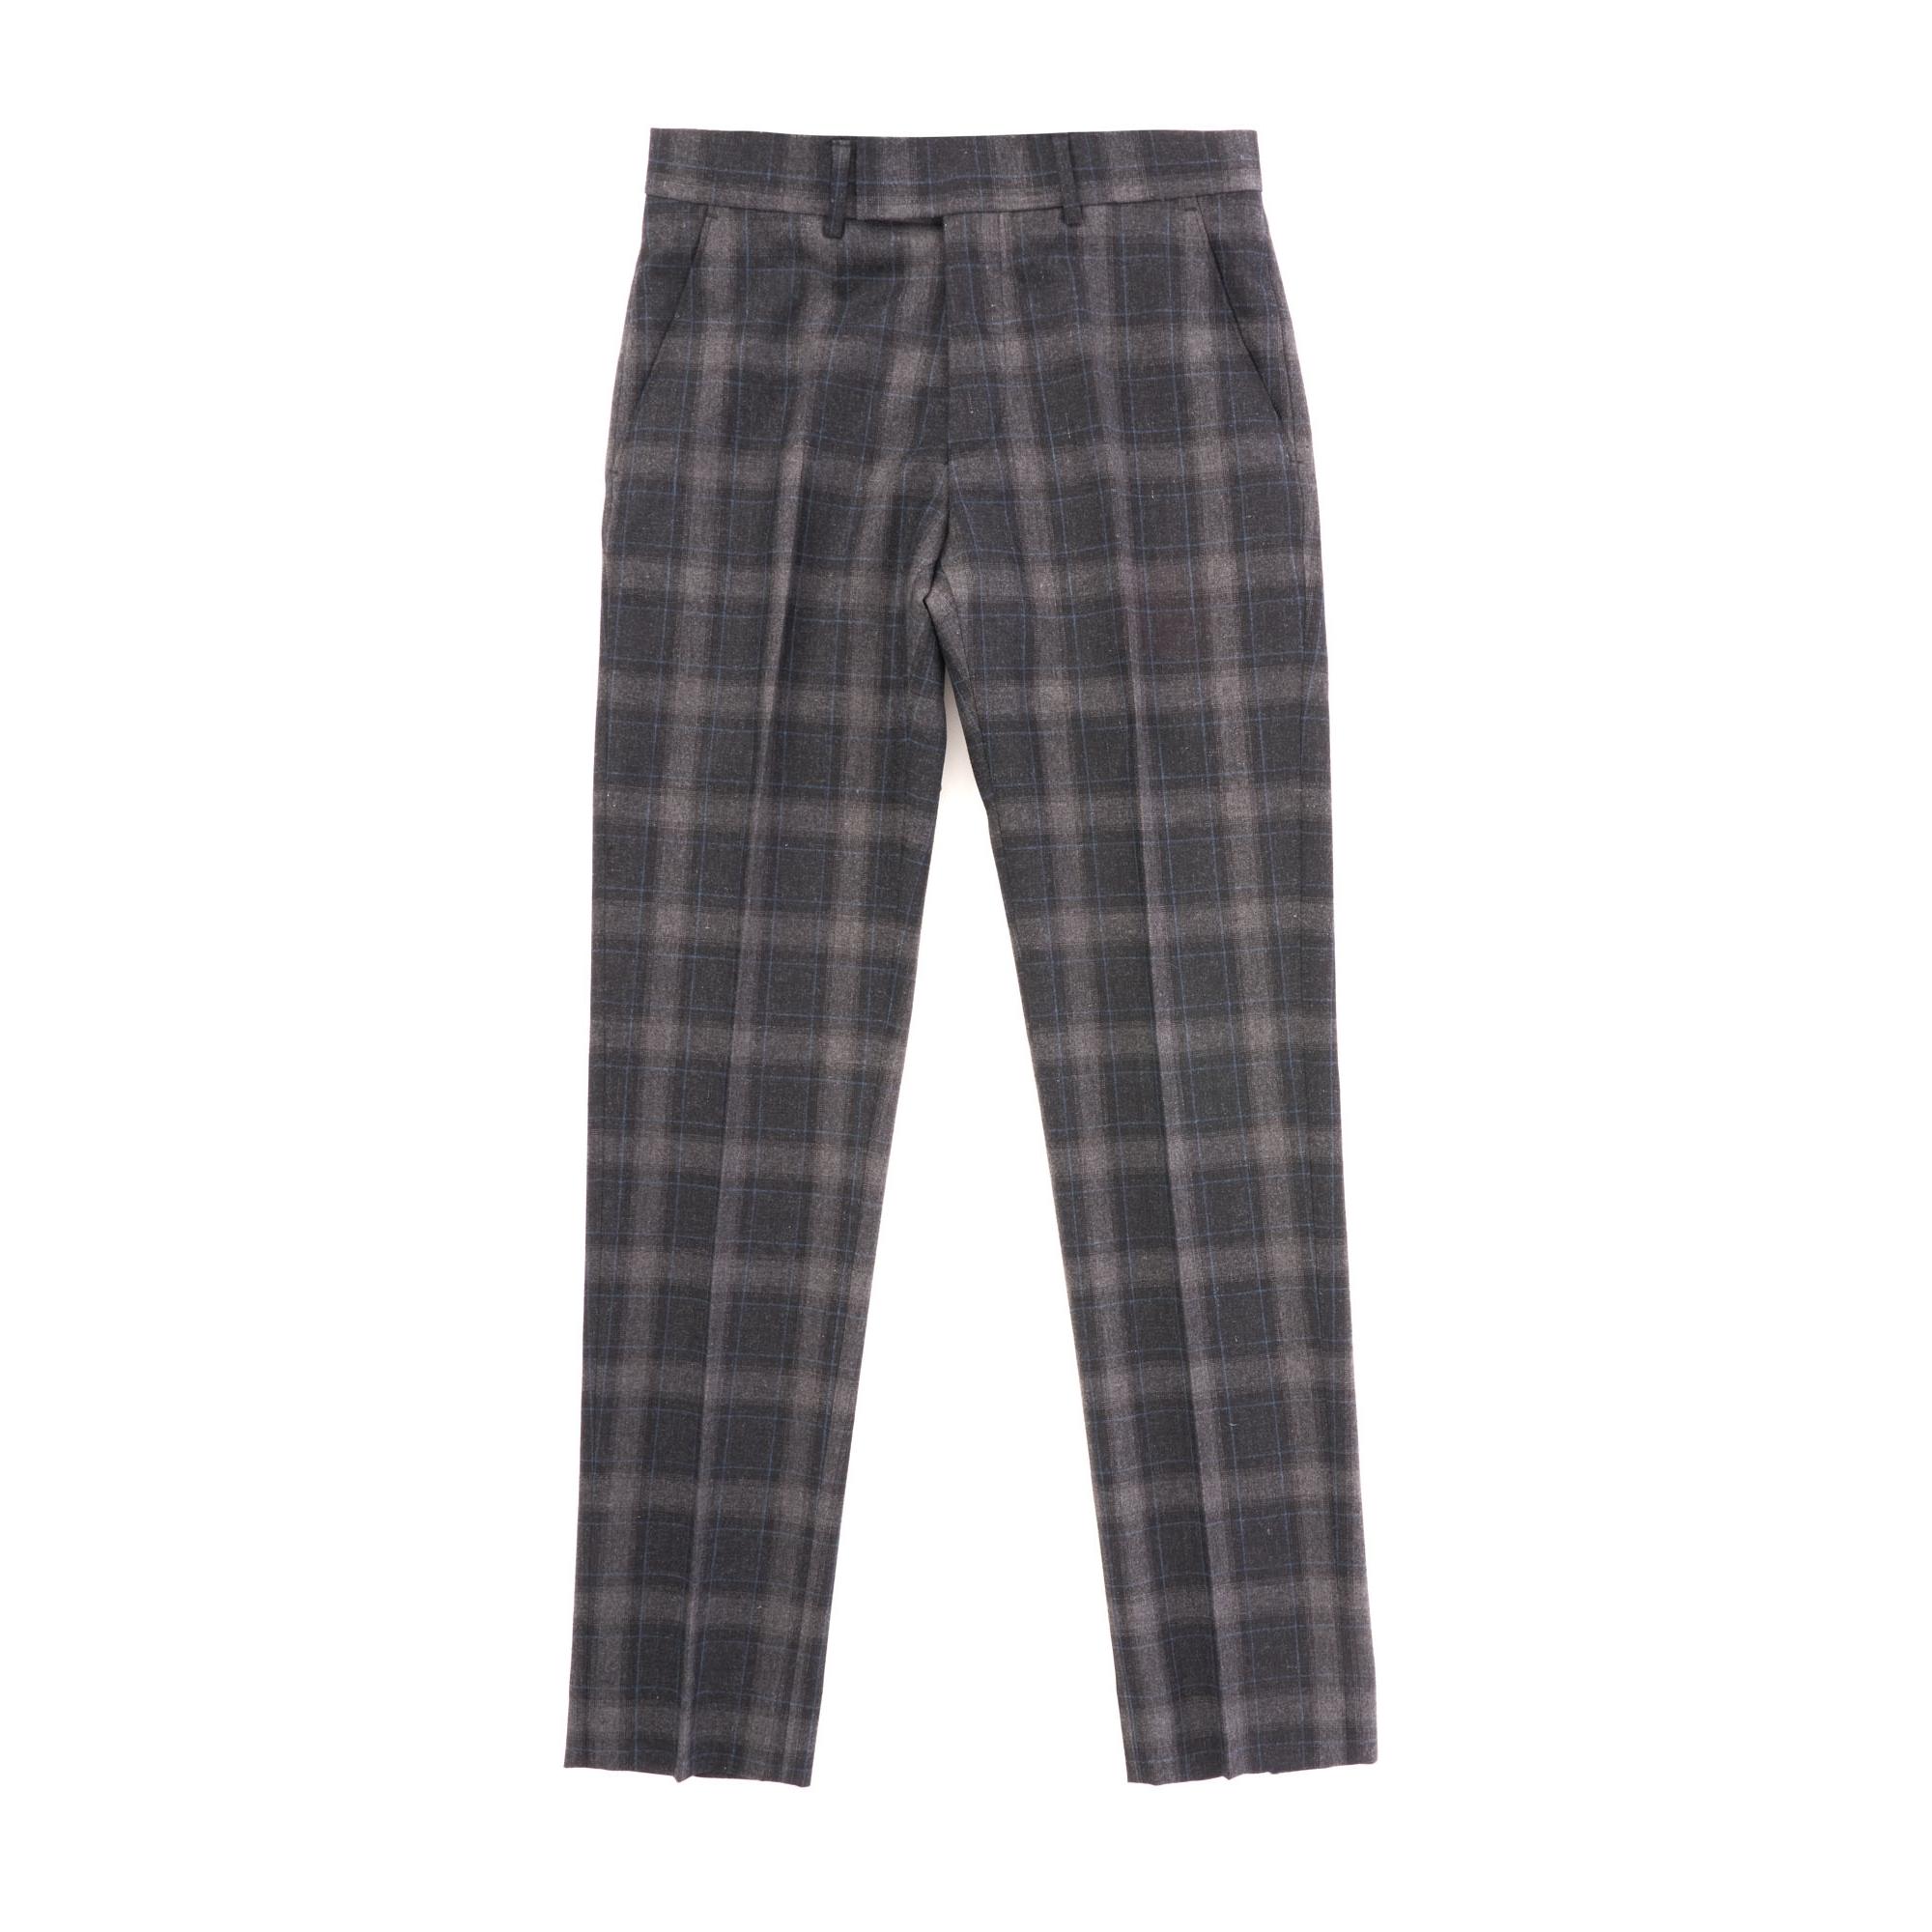 Tartan Check Trousers - Charcoal